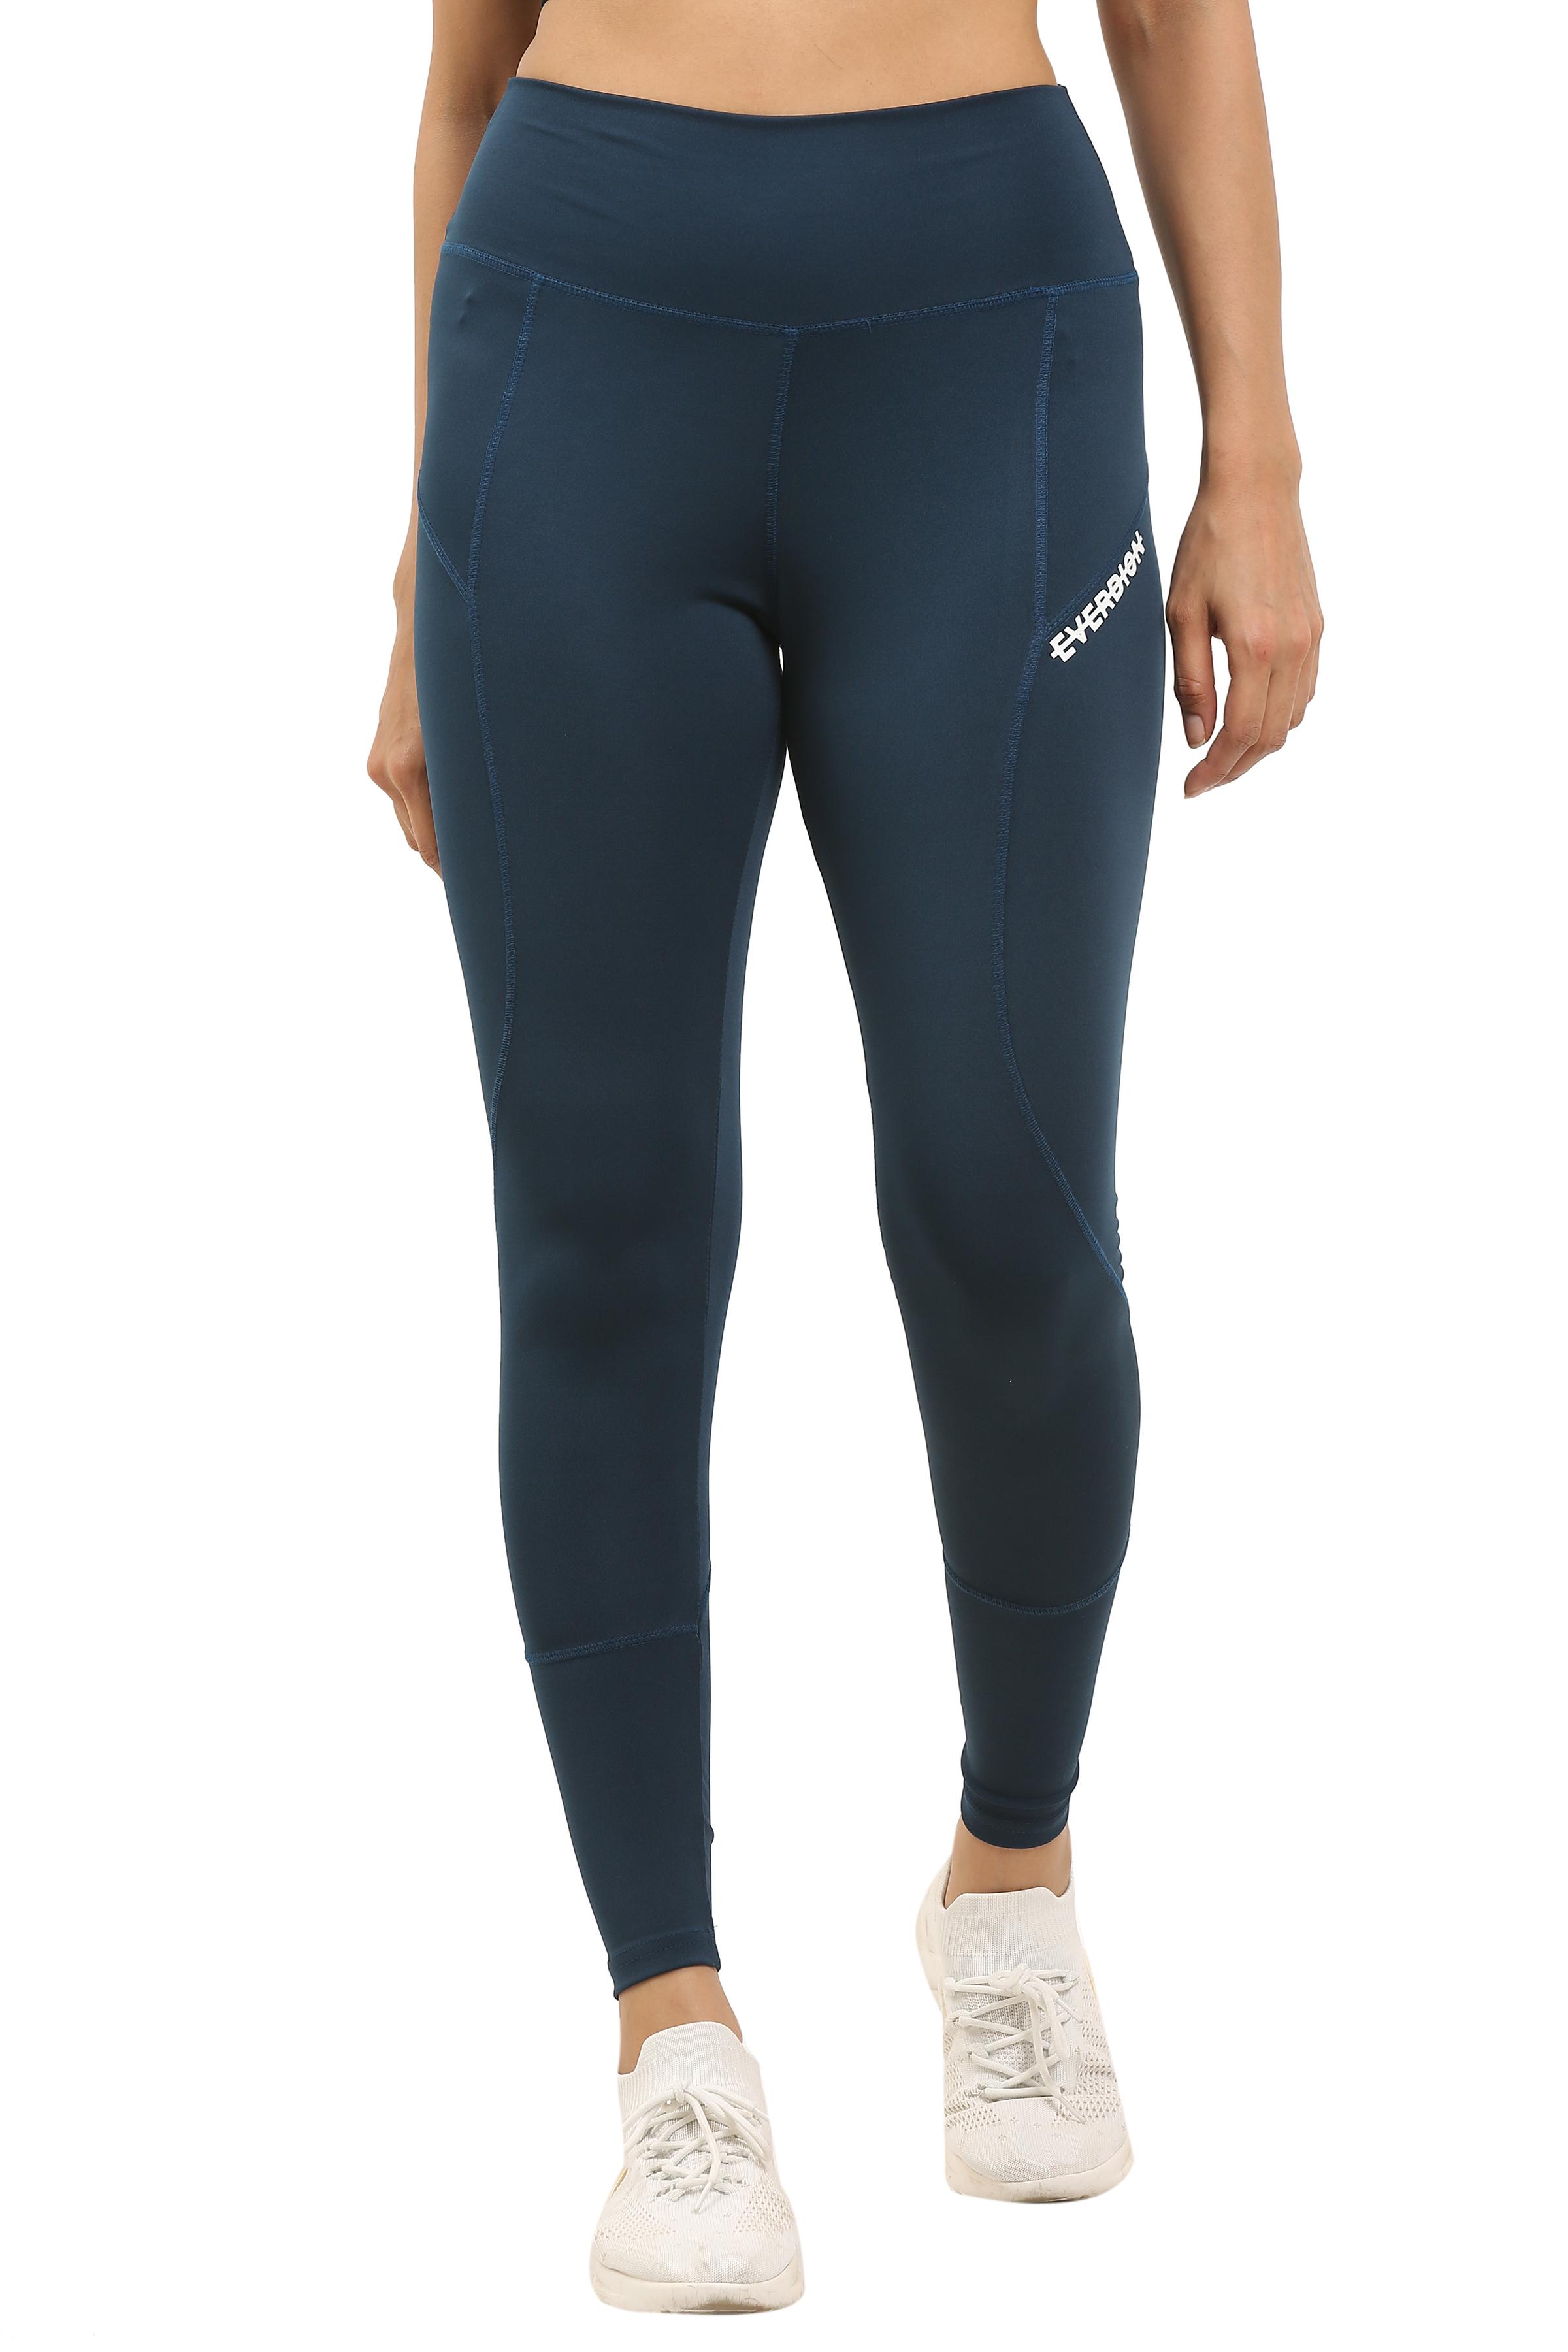 EVERDION | Blue Sports Leggings